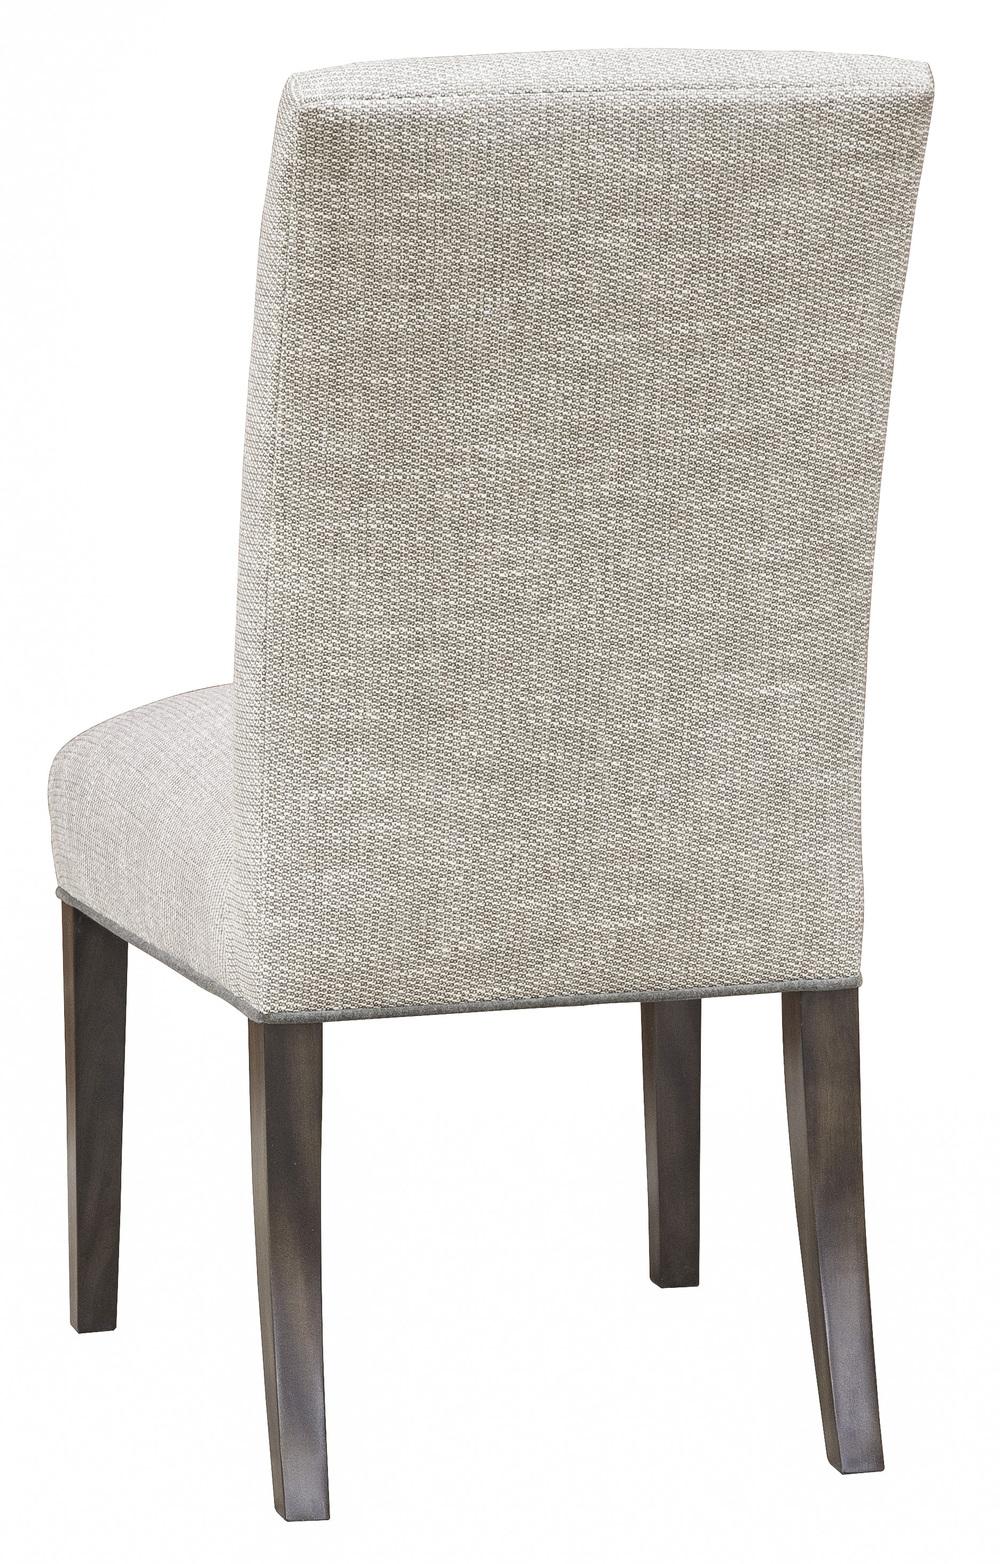 Vanguard Furniture - Butler Side Chair